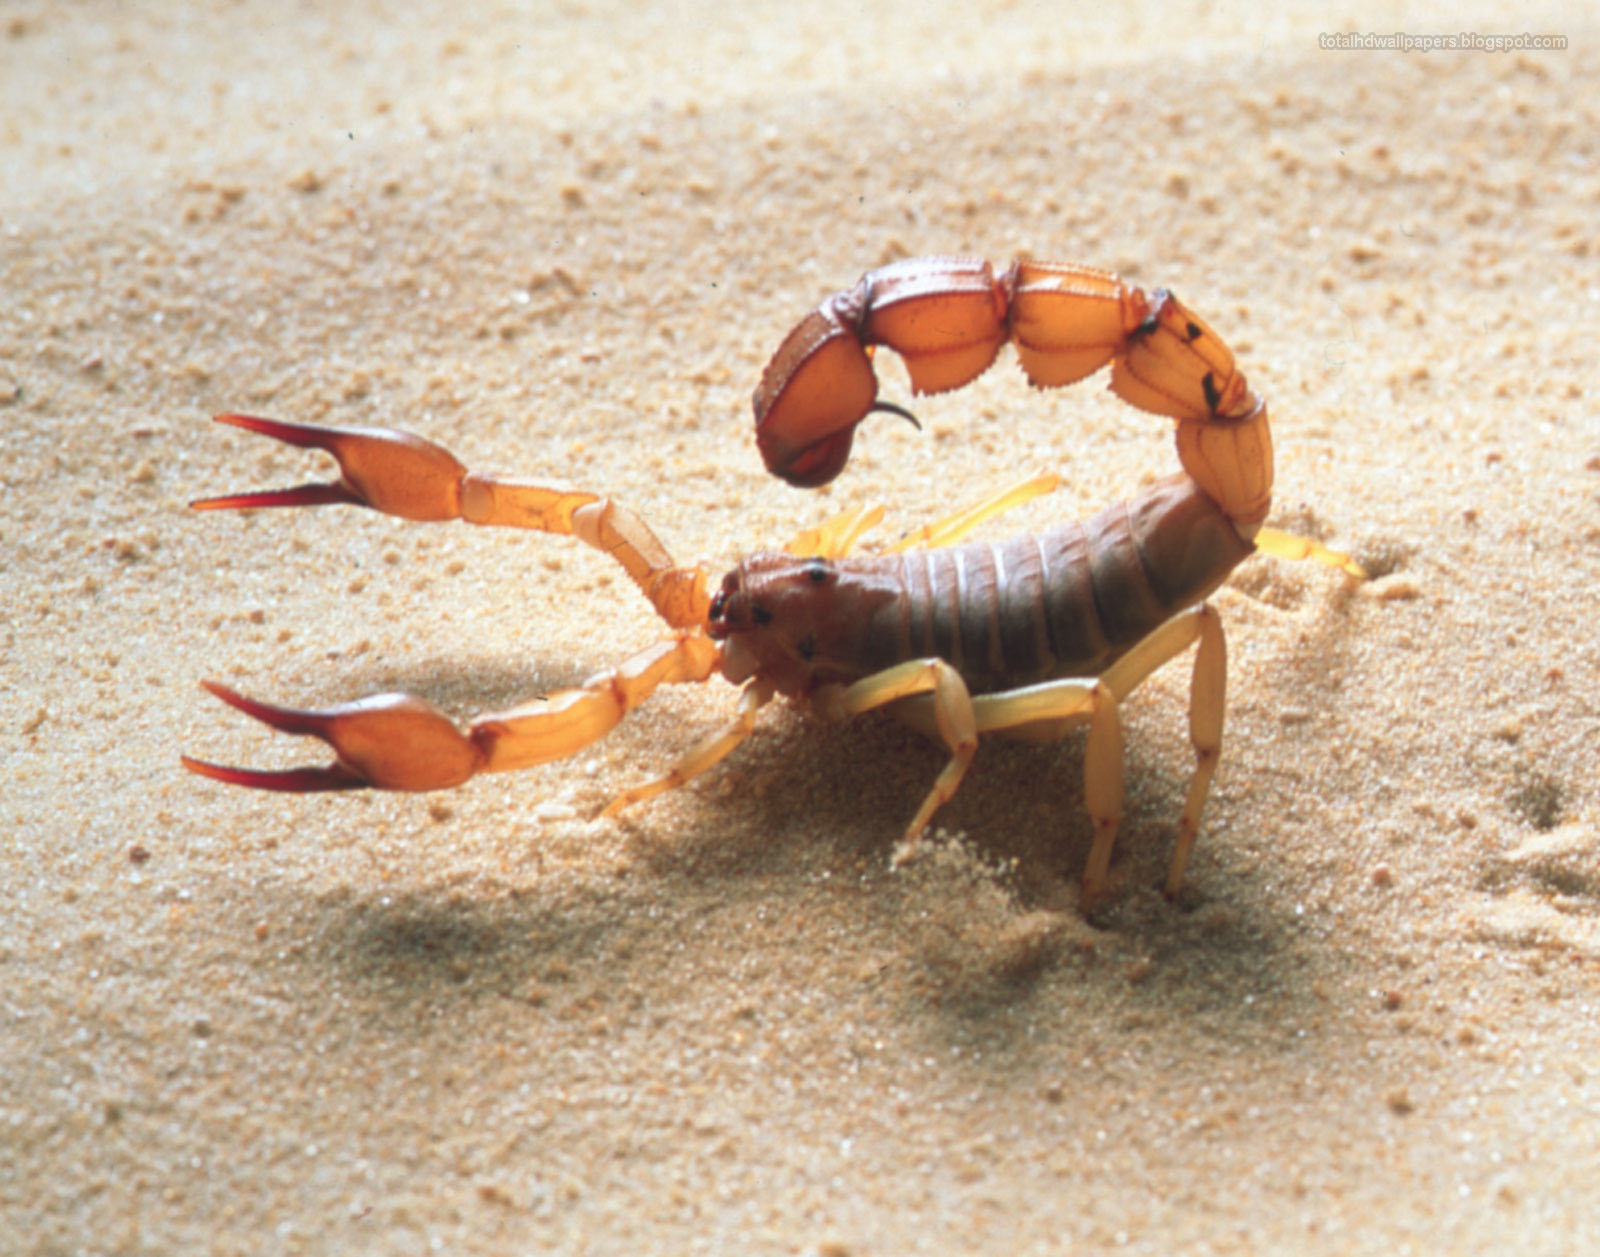 Scorpion wallpapers hd 1600x1257